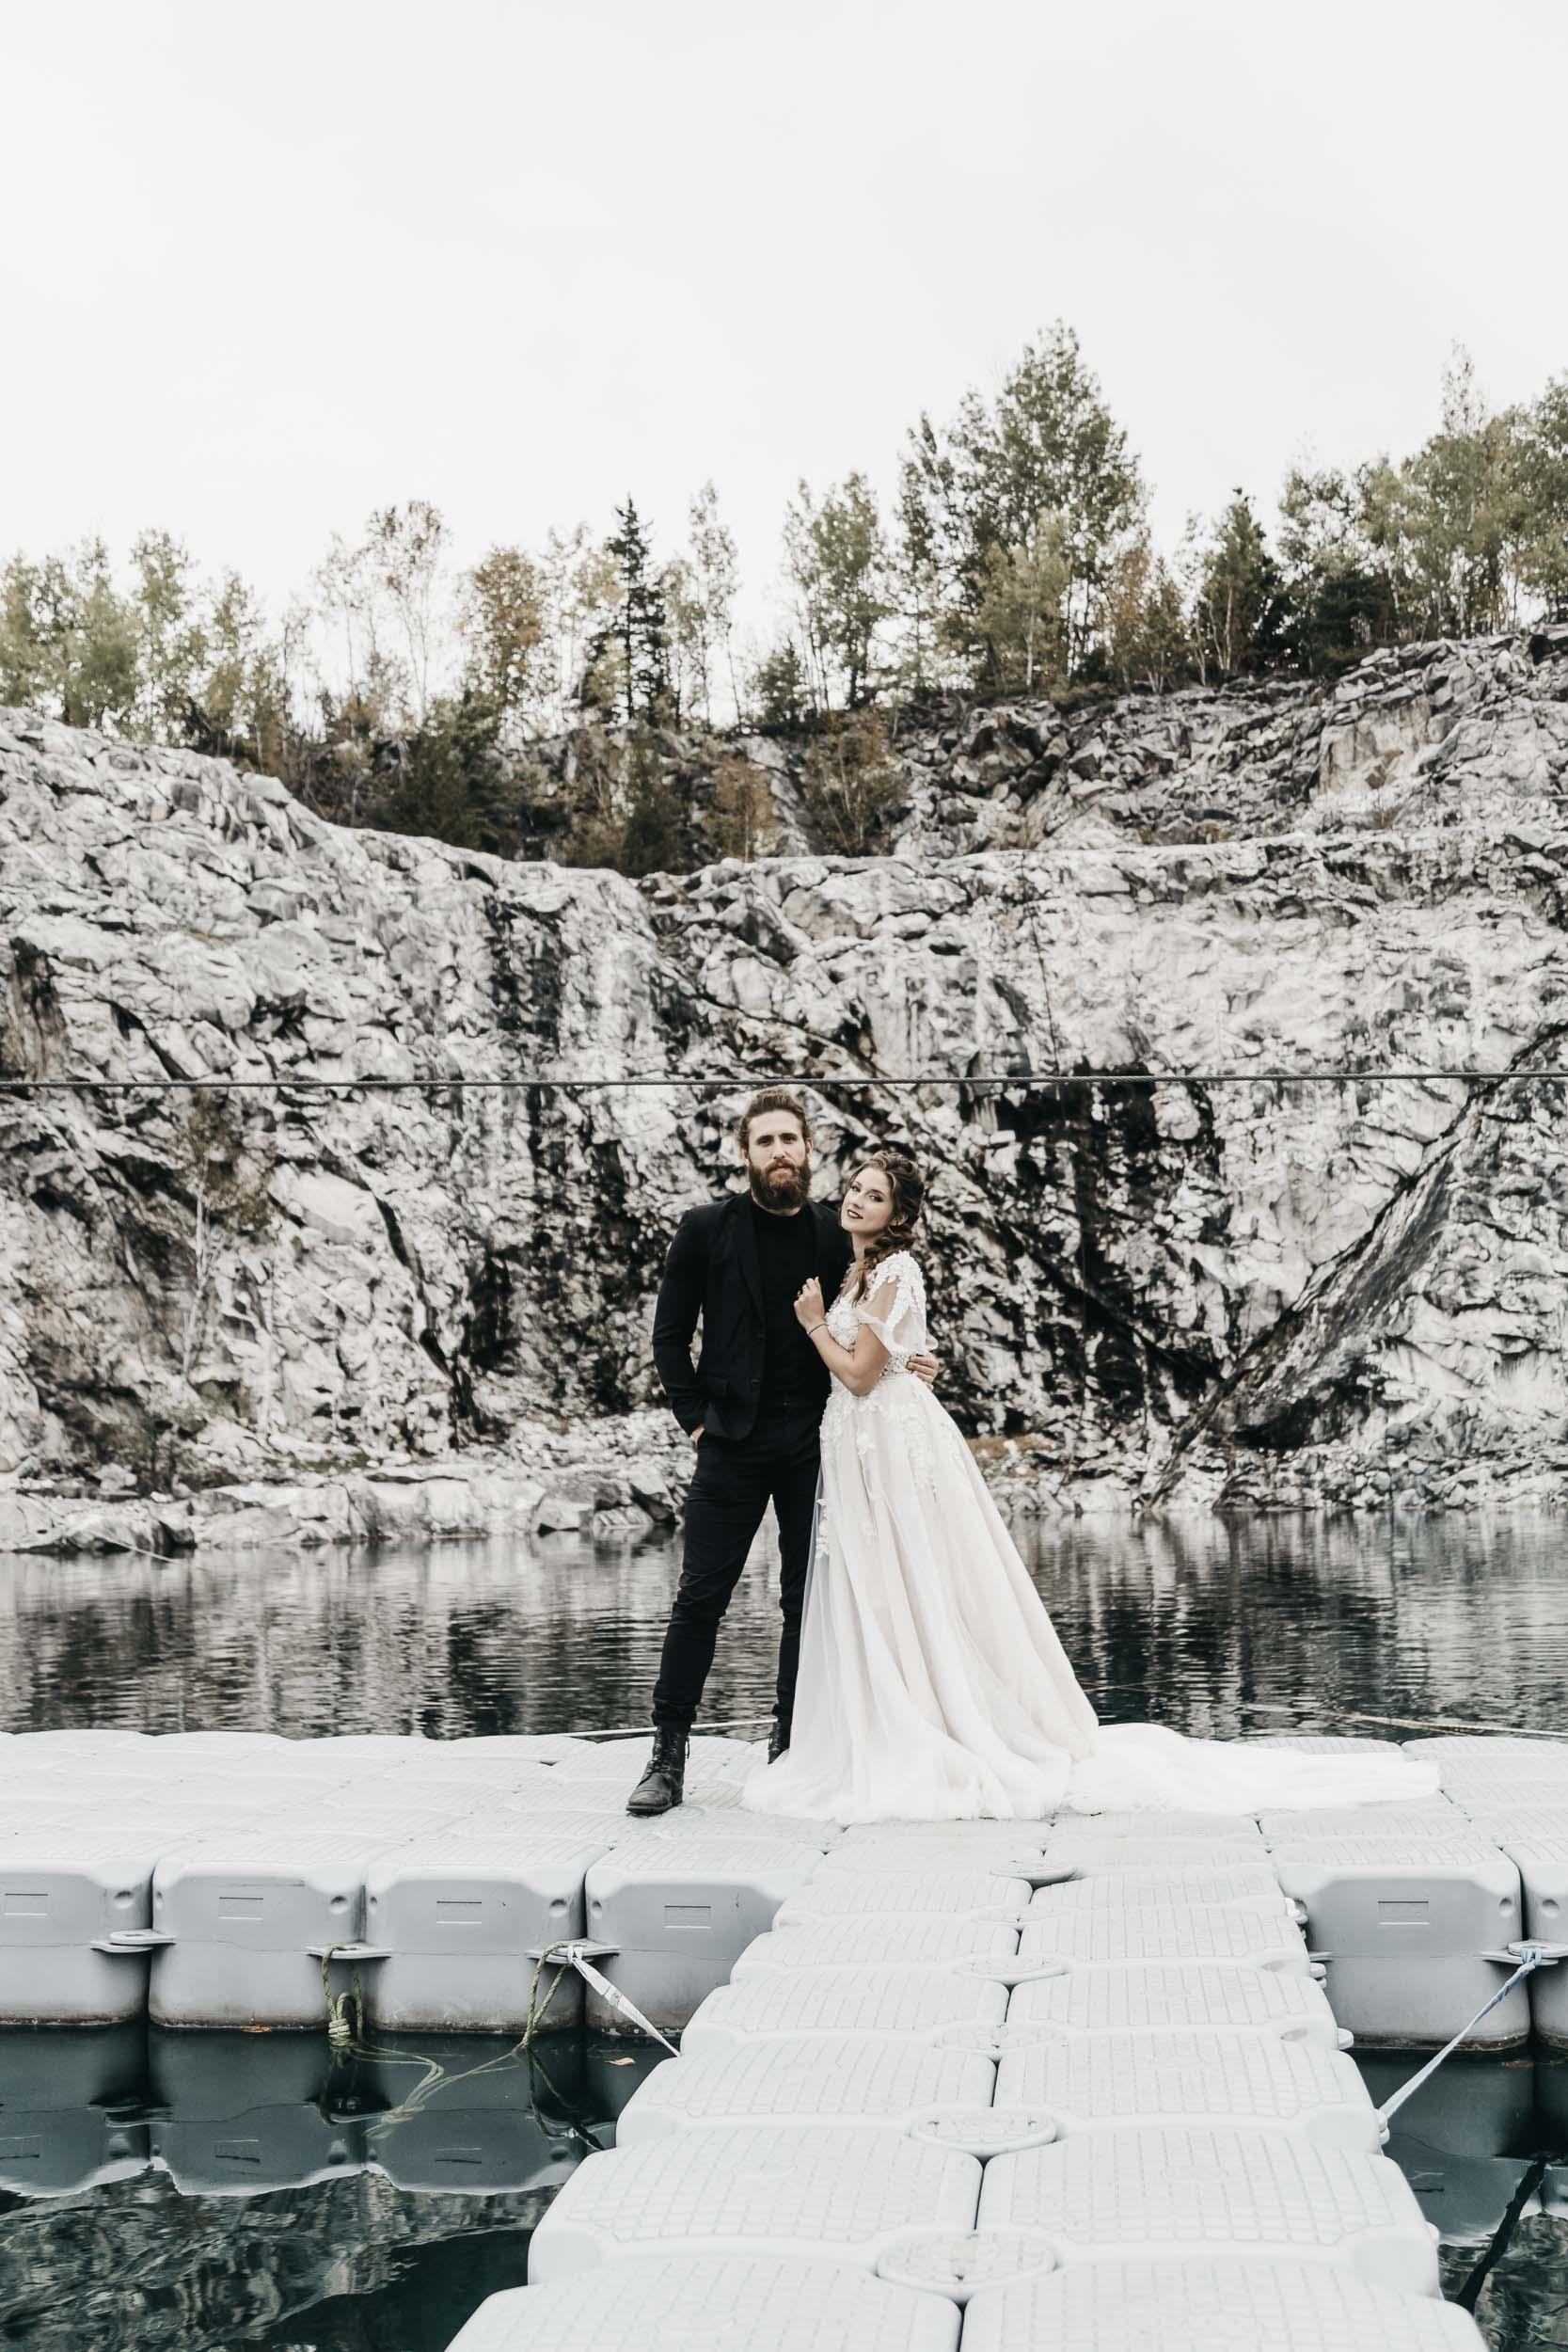 intimate-wedding-elopement-photographer-ottawa-toronto-9927.jpg